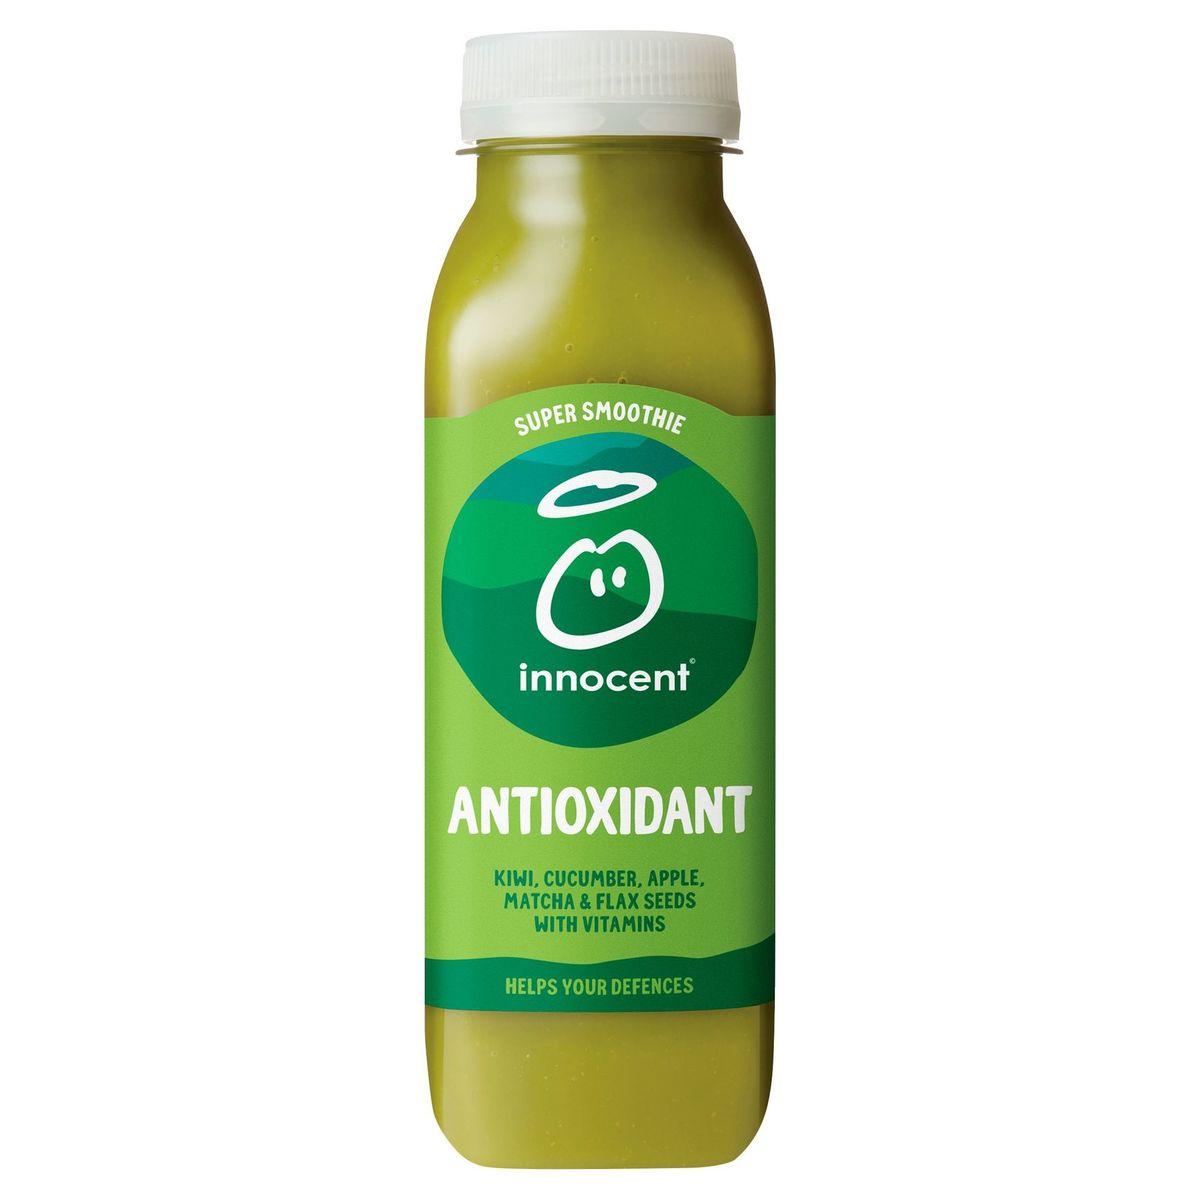 Innocent Super Smoothie Antioxidant Kiwi, Cucumber, Apple, Matcha & Flax Seeds with Vitamins 300 ml